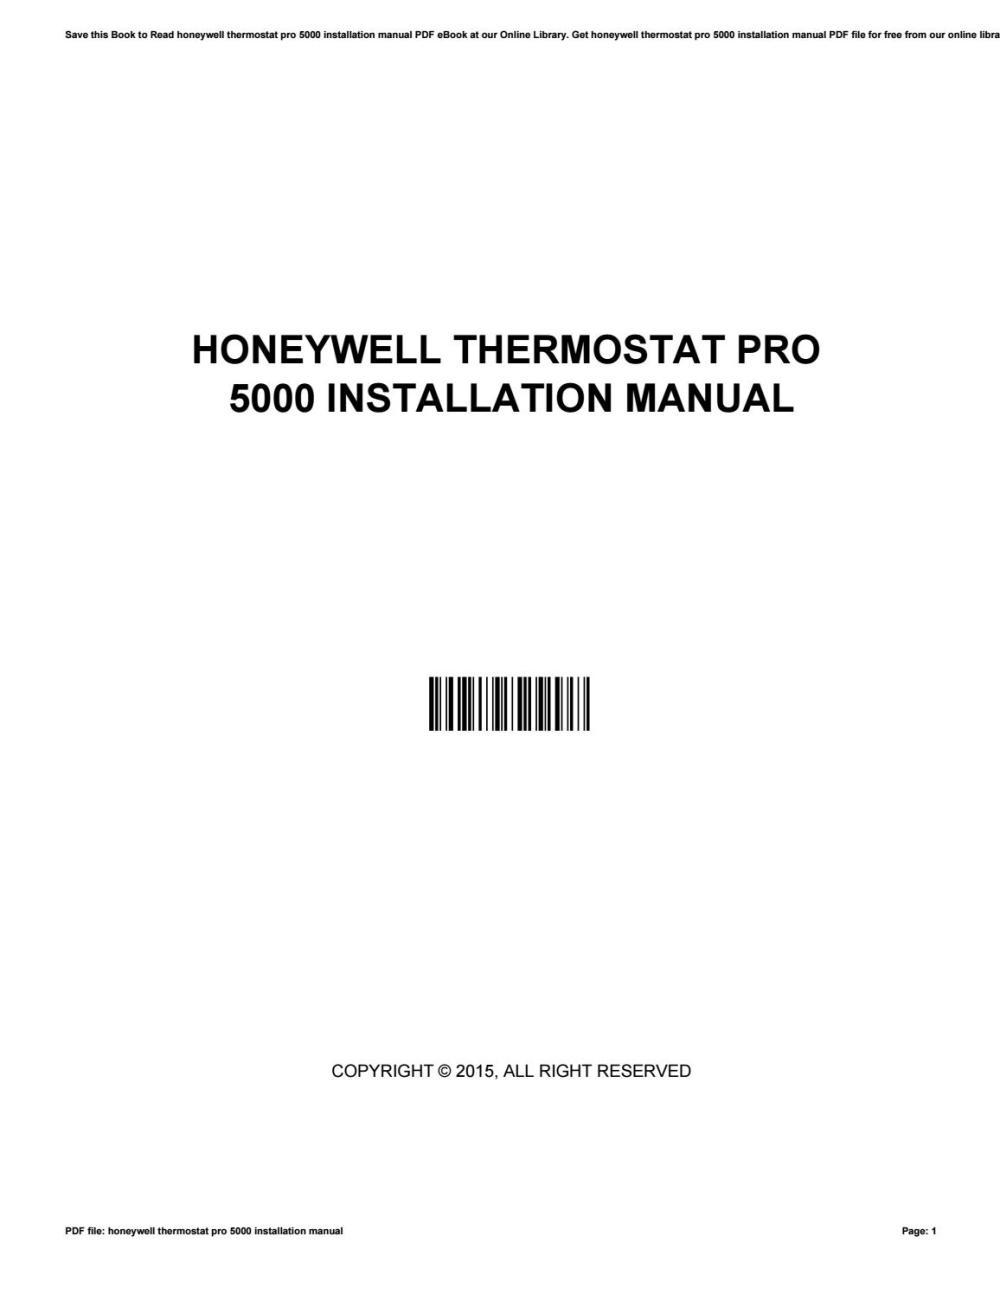 medium resolution of honeywell thermostat pro 5000 installation manual by jamiegorman3869 issuu